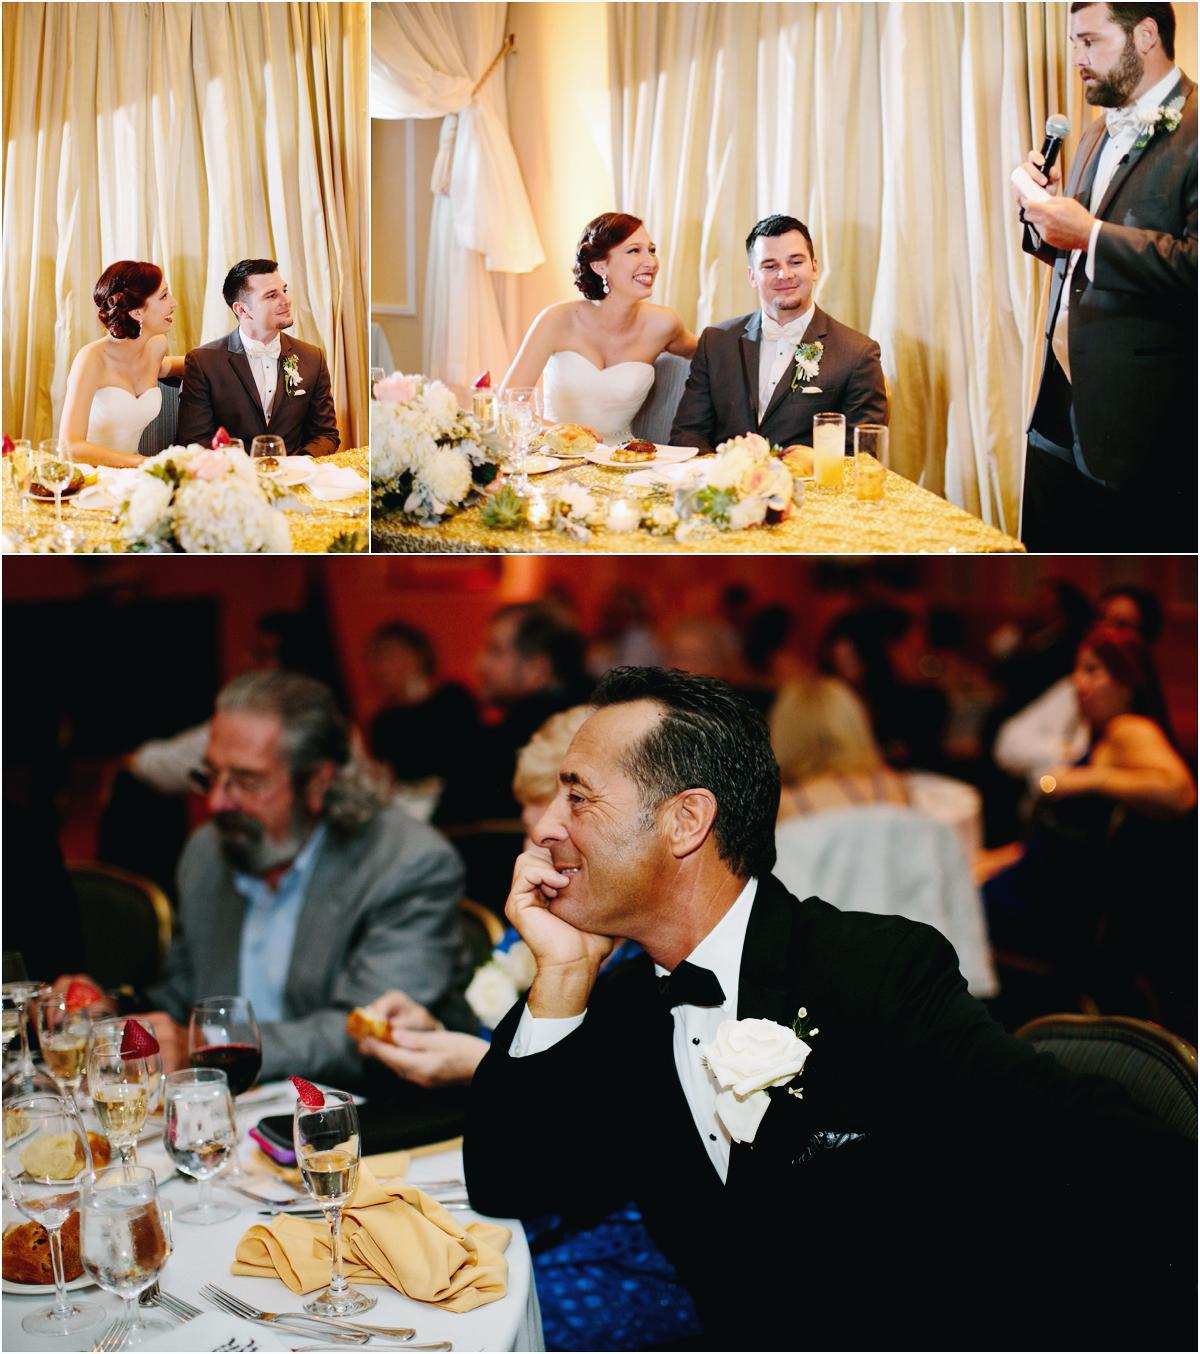 Palm_Beach_Eau_wedding_Photographer_0035